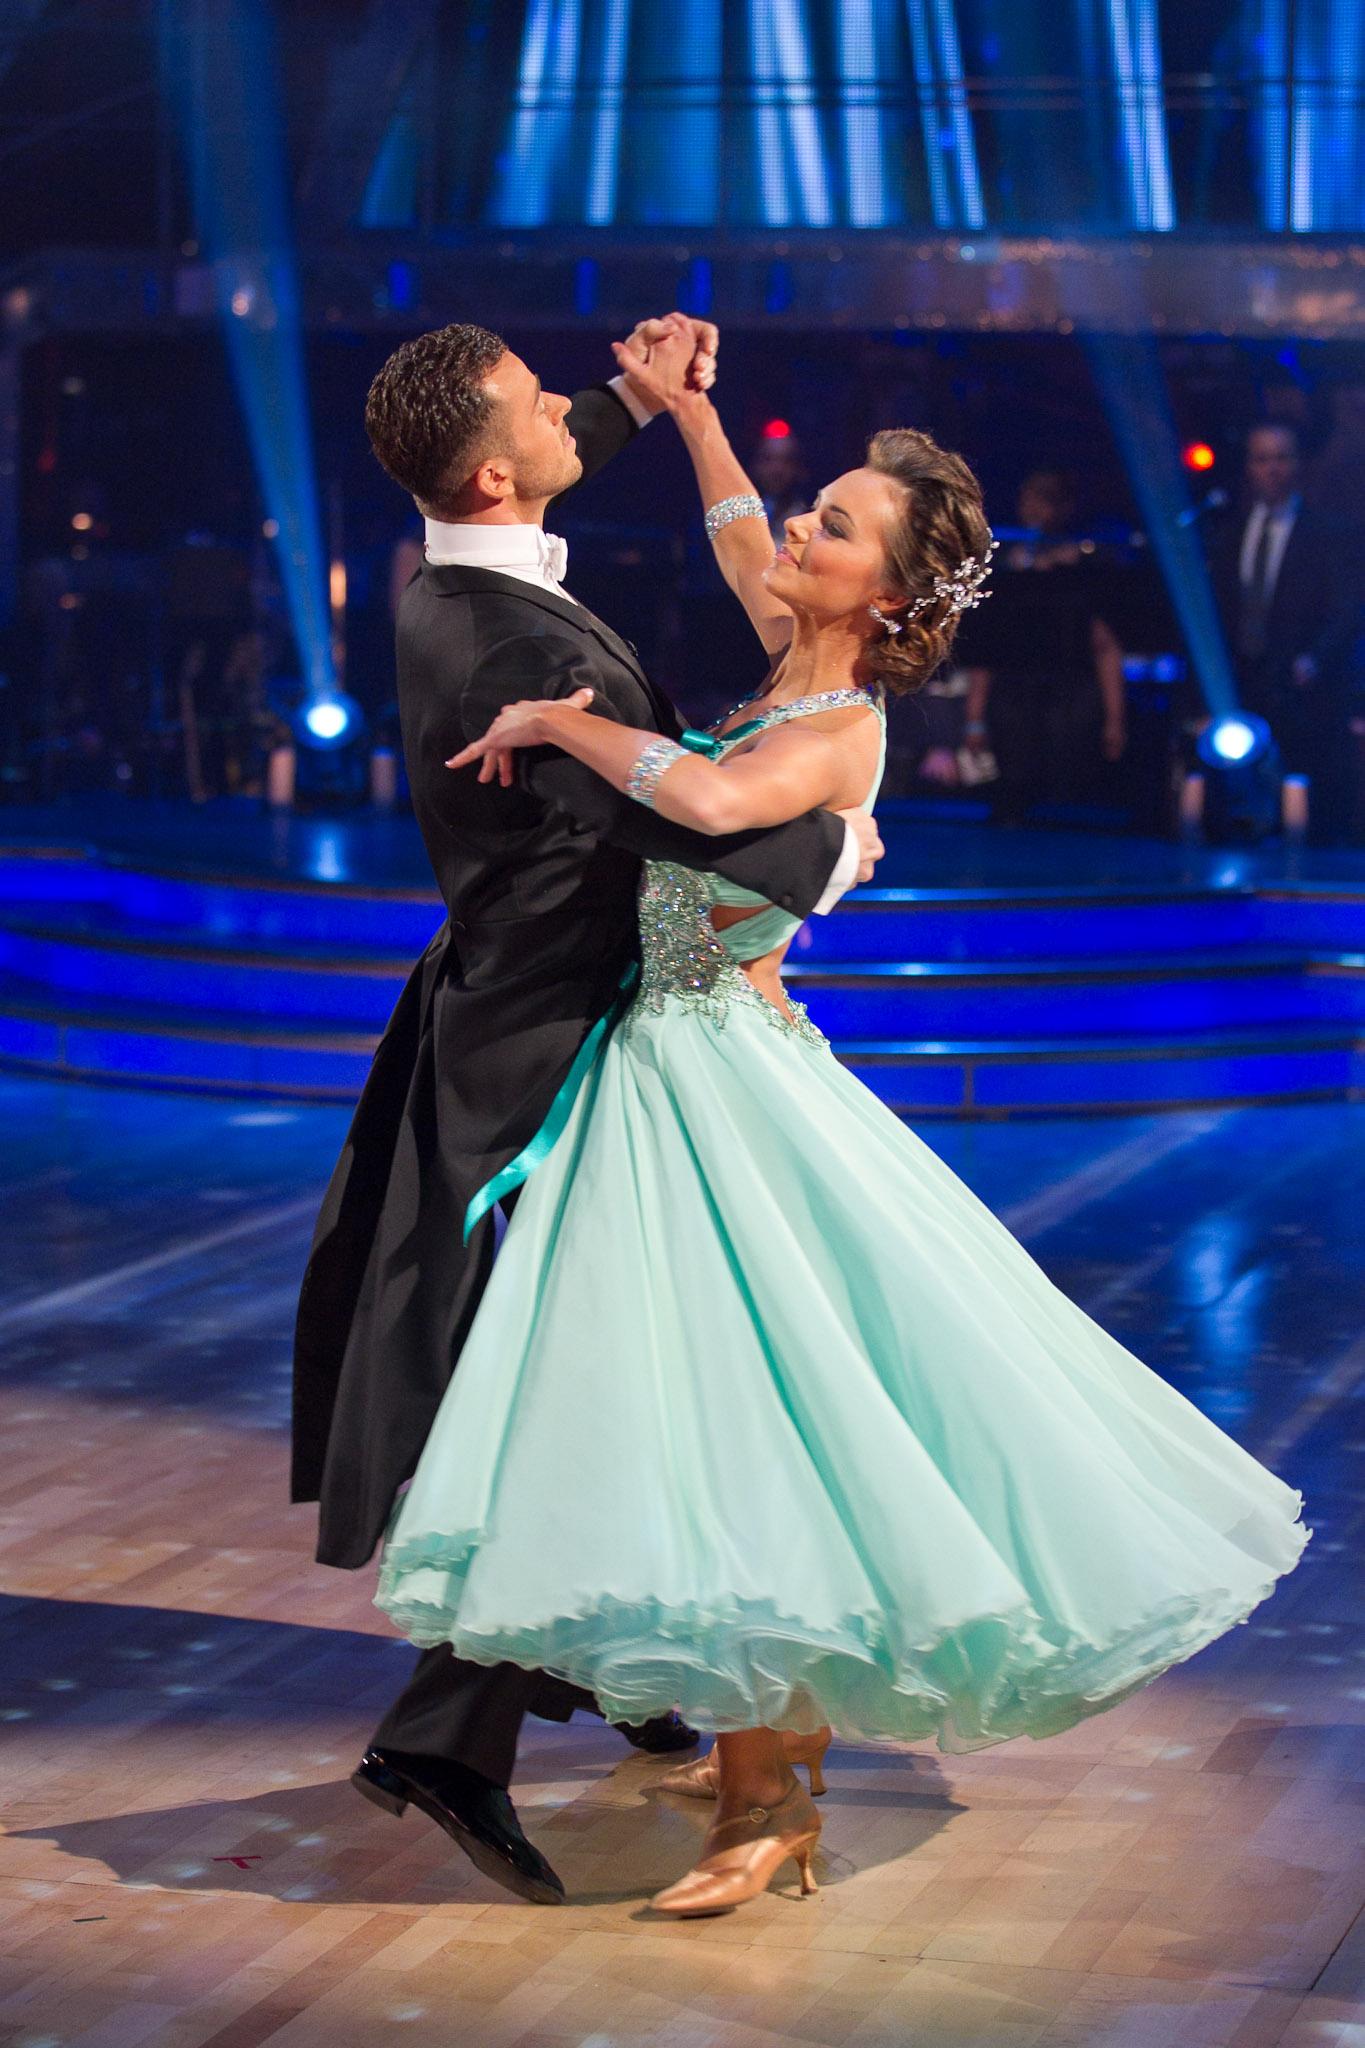 two dancers perform a veinnese waltz